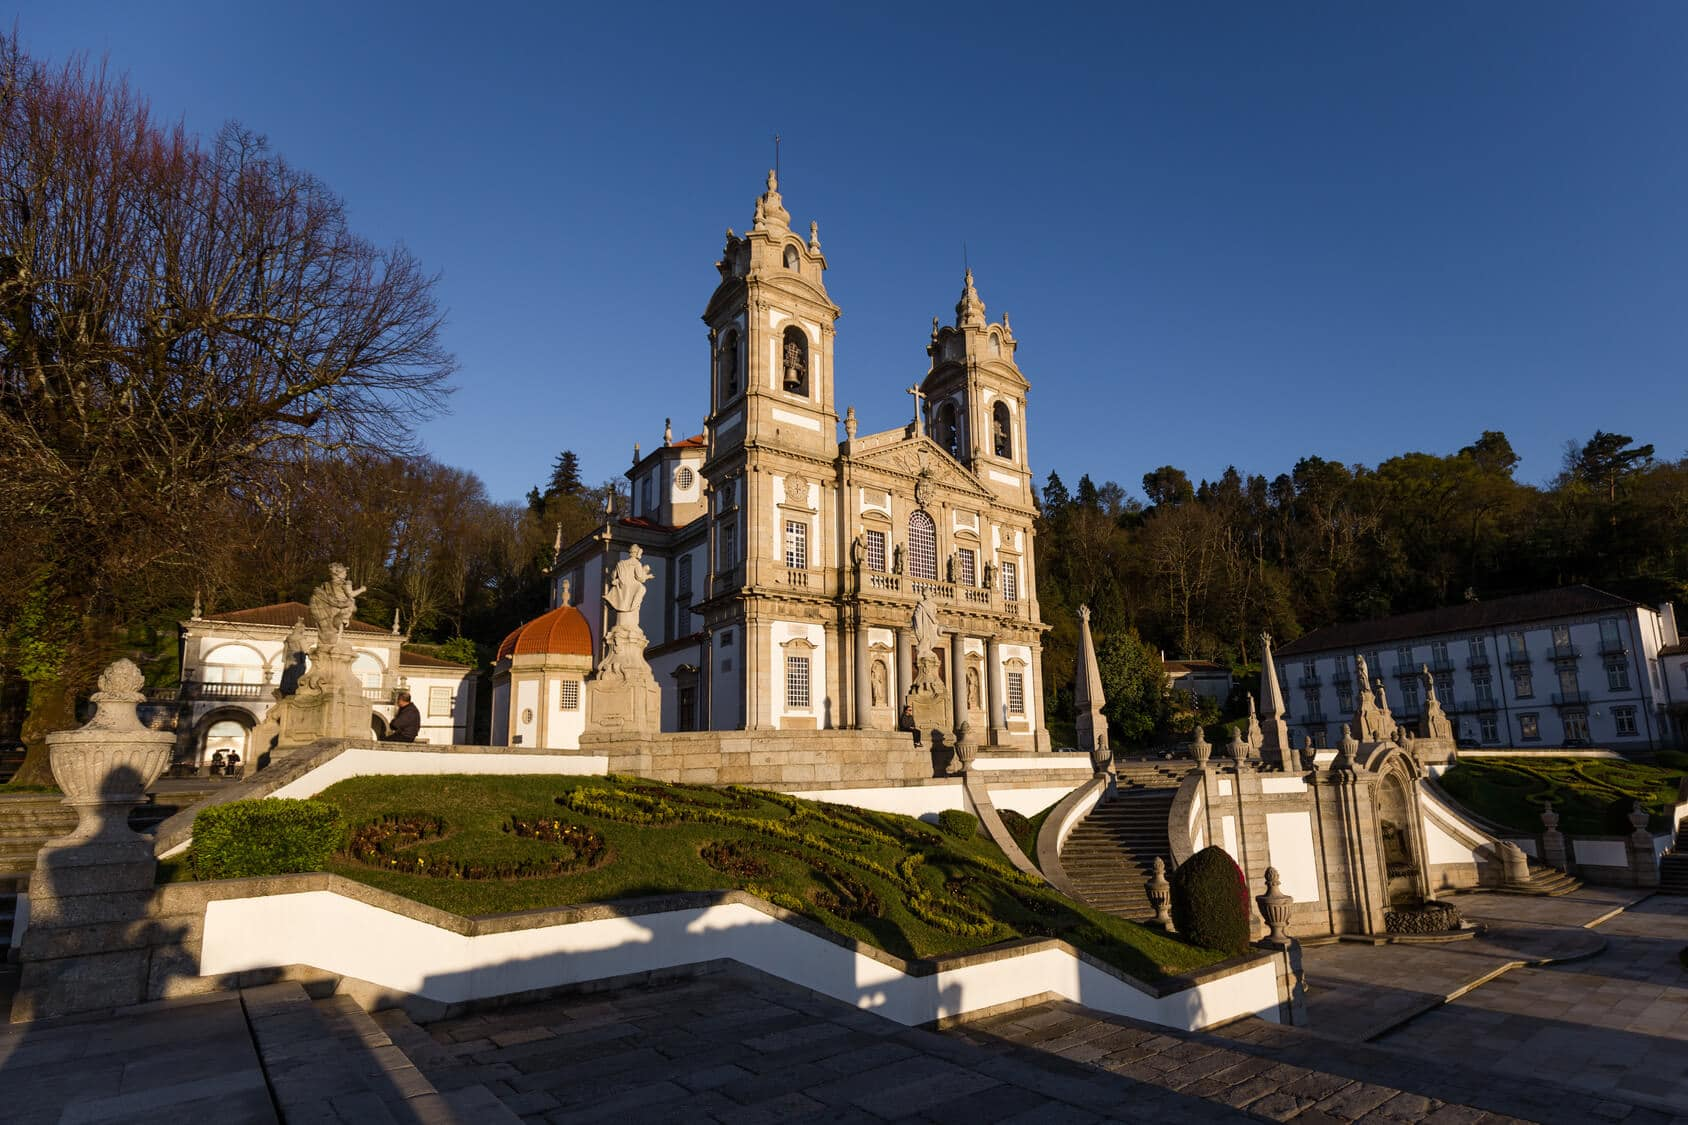 Visitas Guiadas Braga e Guimarães - Visita a Monumentos da Cidade